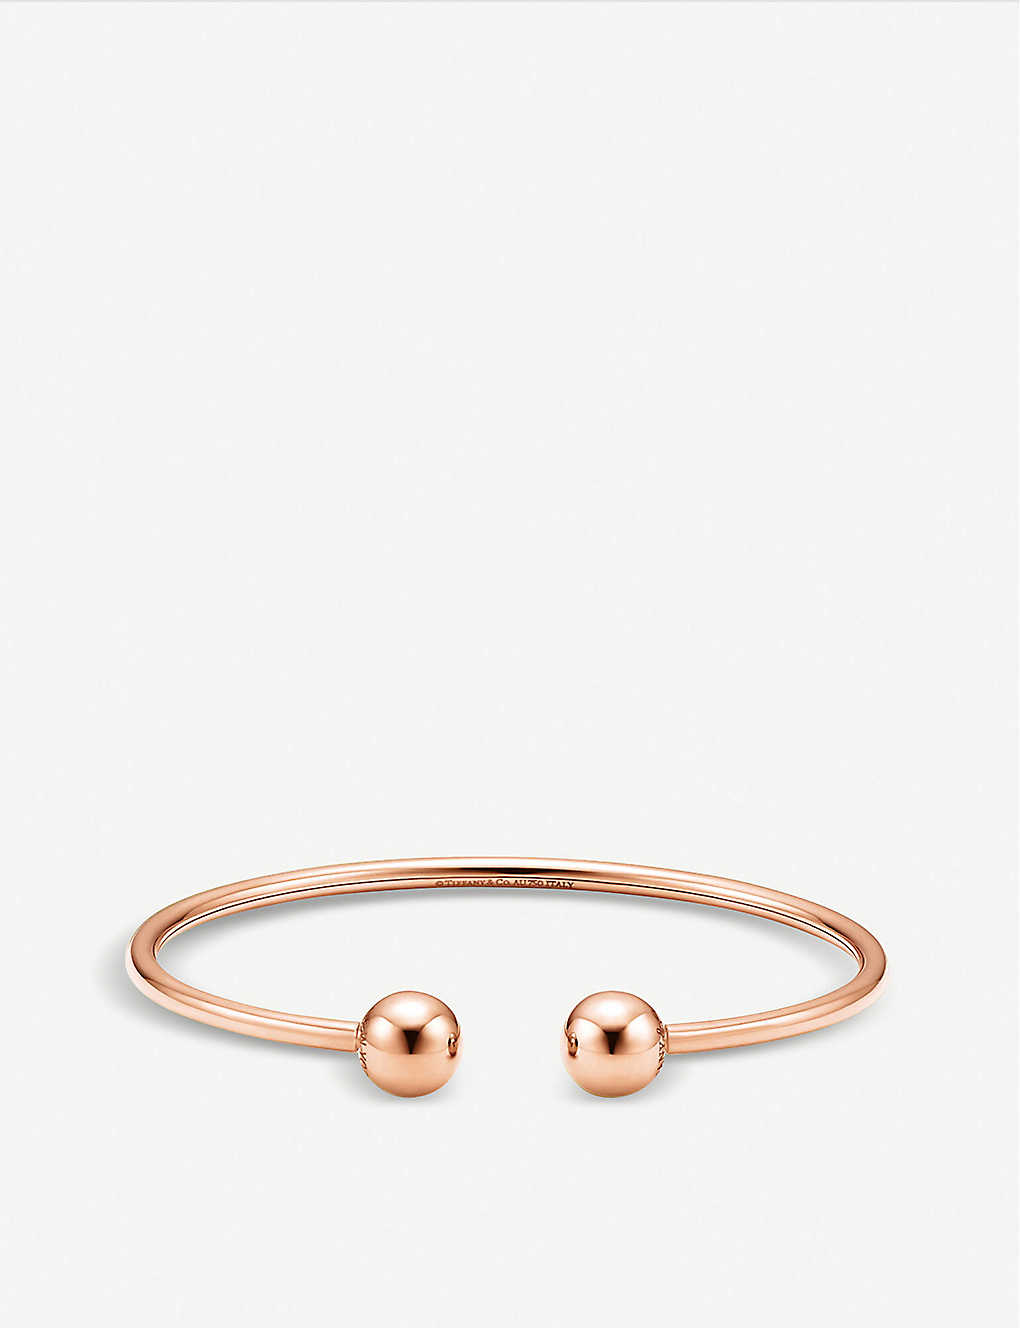 c8d32fe9d Tiffany City HardWear 18k rose-gold ball wire bracelet - Rose gold ...